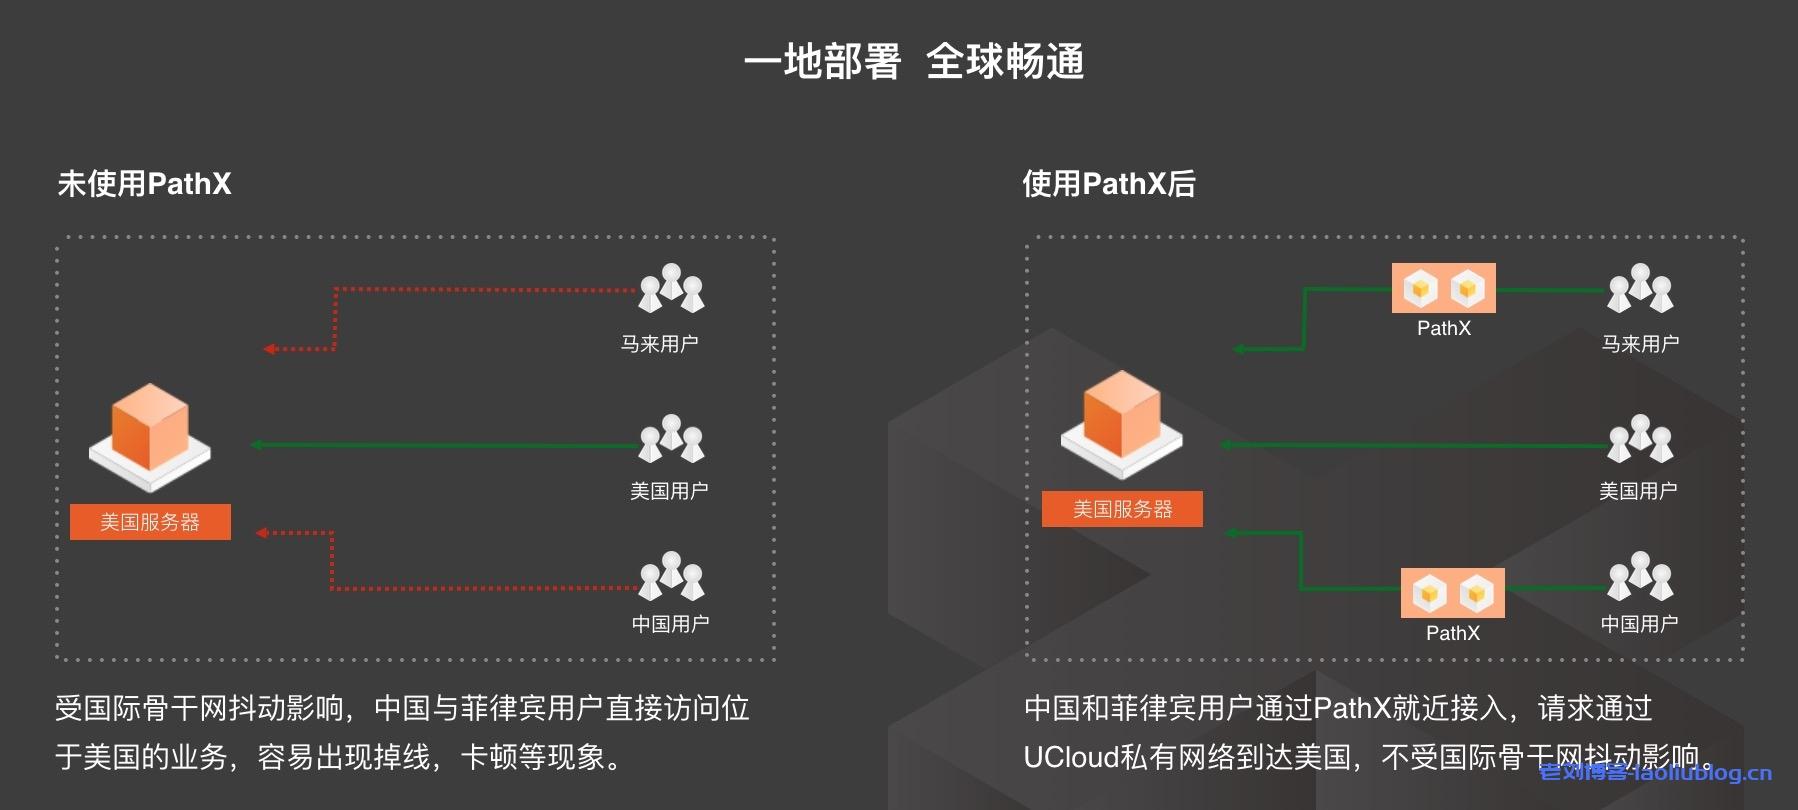 UCloud优刻得全球动态加速(PathX)产品使用指南